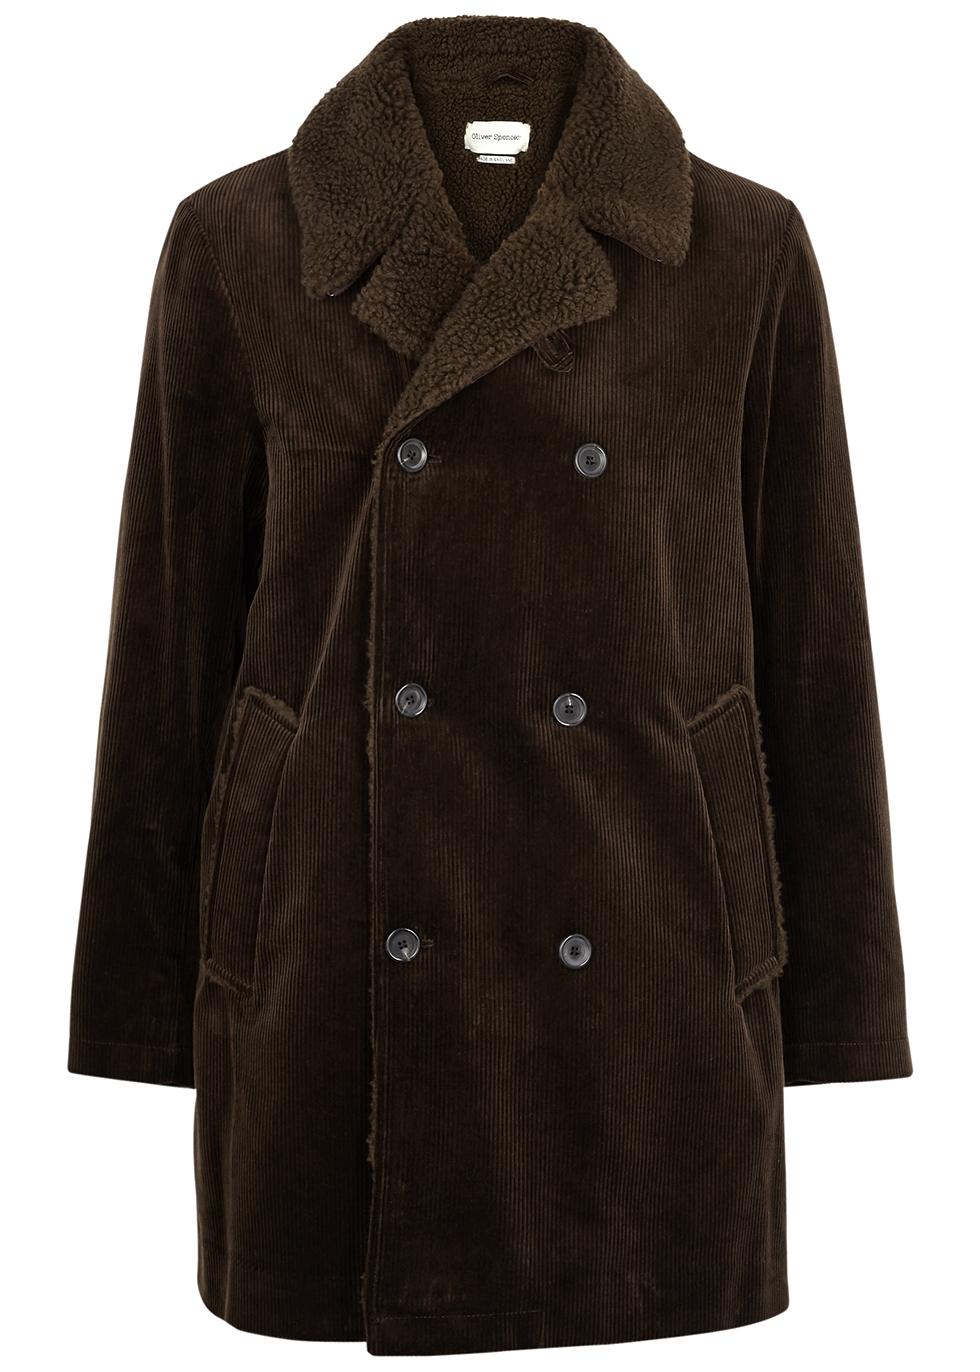 Newington faux shearling-lined corduroy jacket